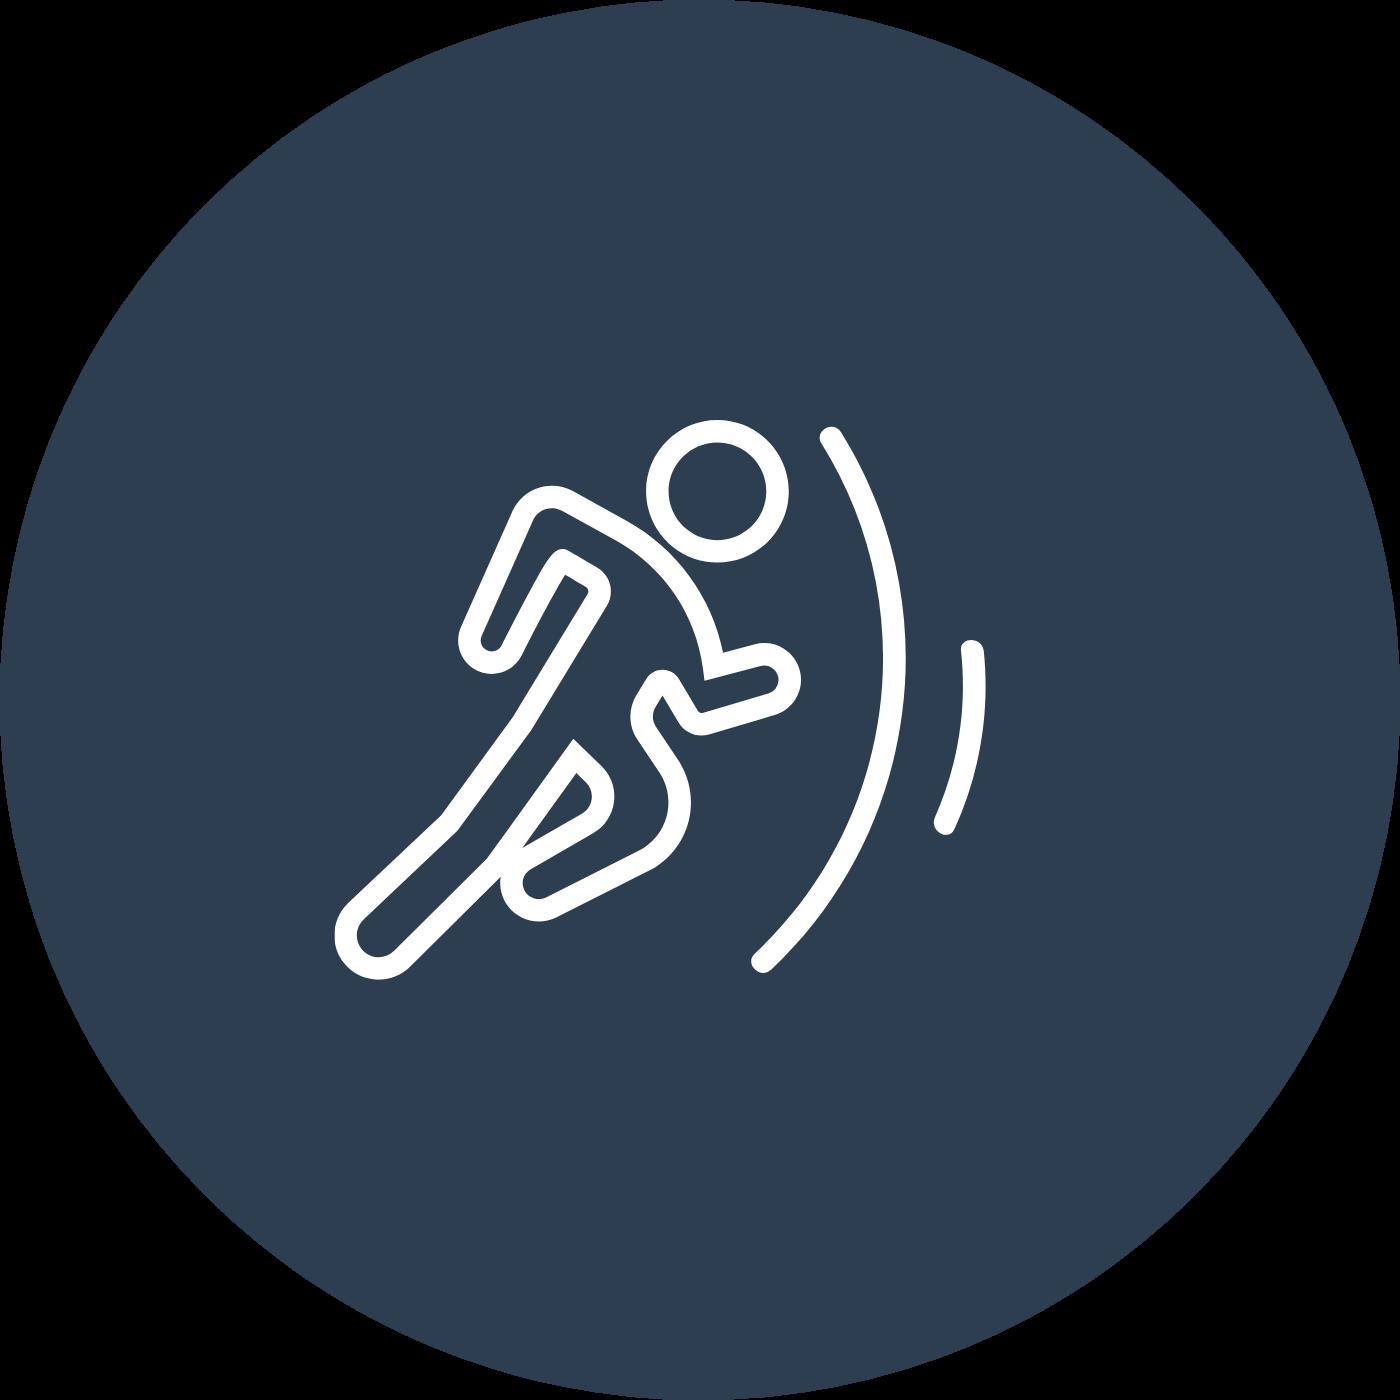 motion detectors icon